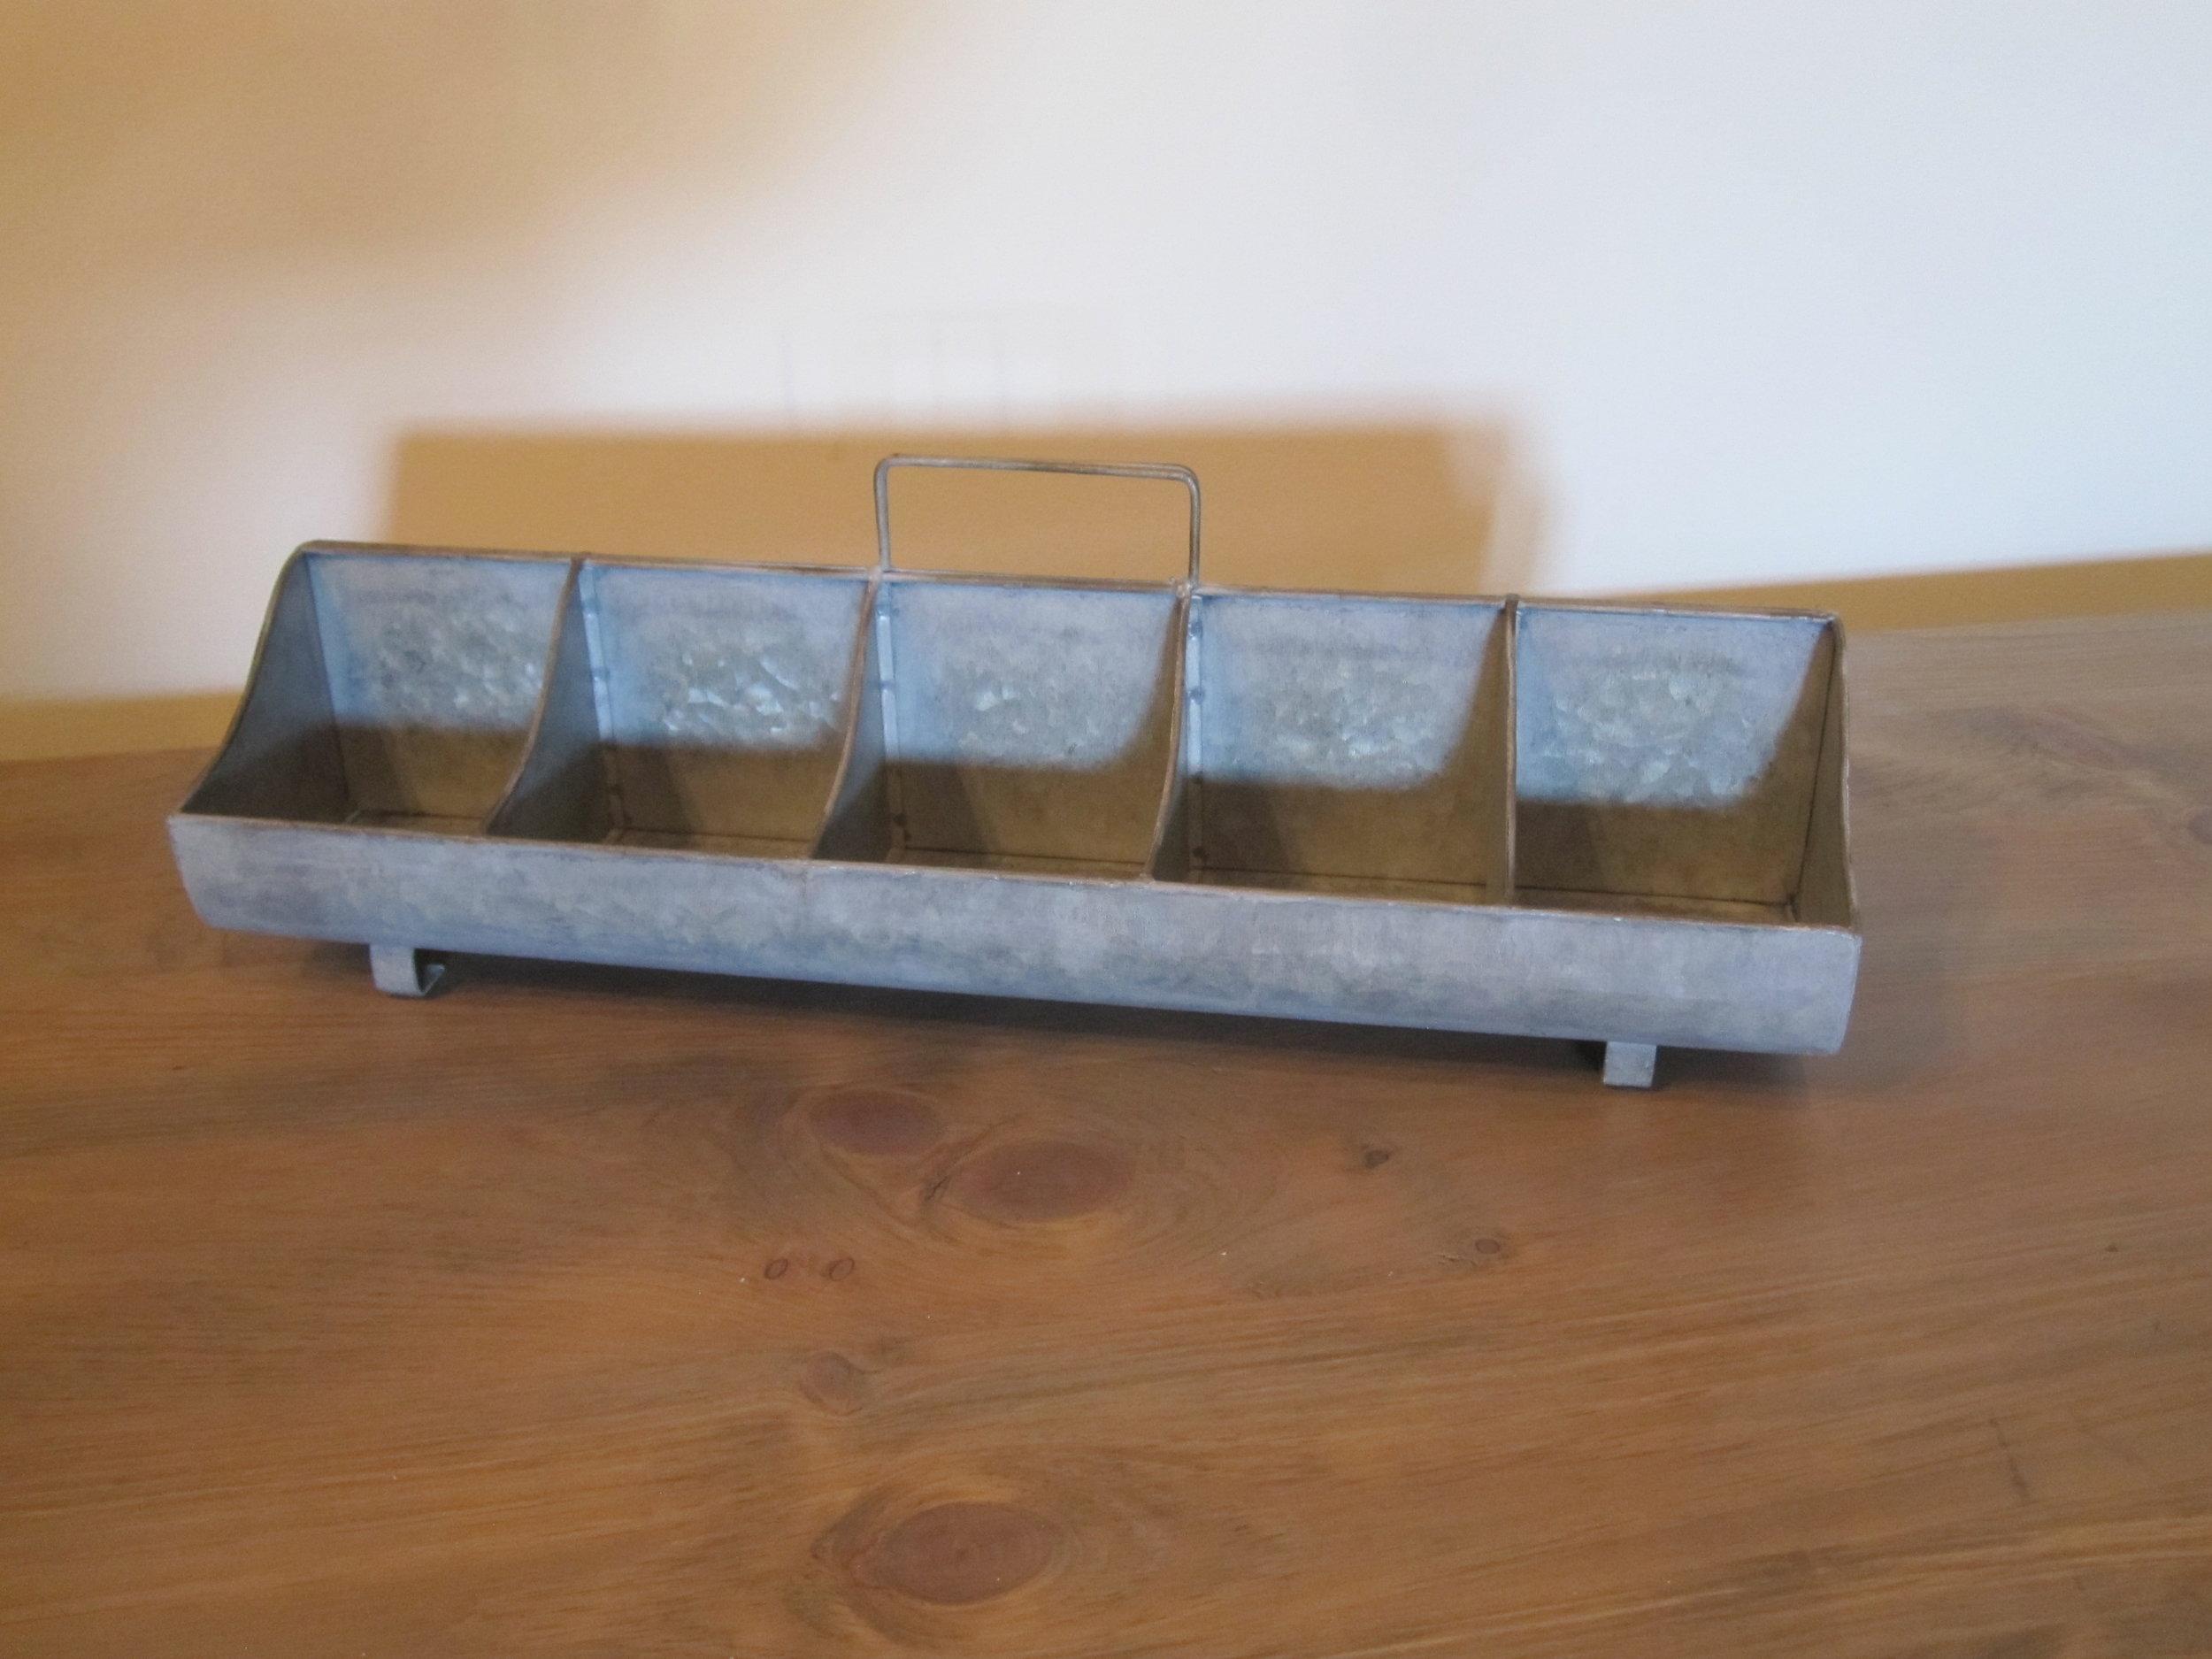 Feeder Tray - Description ~ galvanized with 10 shallow compartmentsQuantity ~ 1Rental Price ~ $8